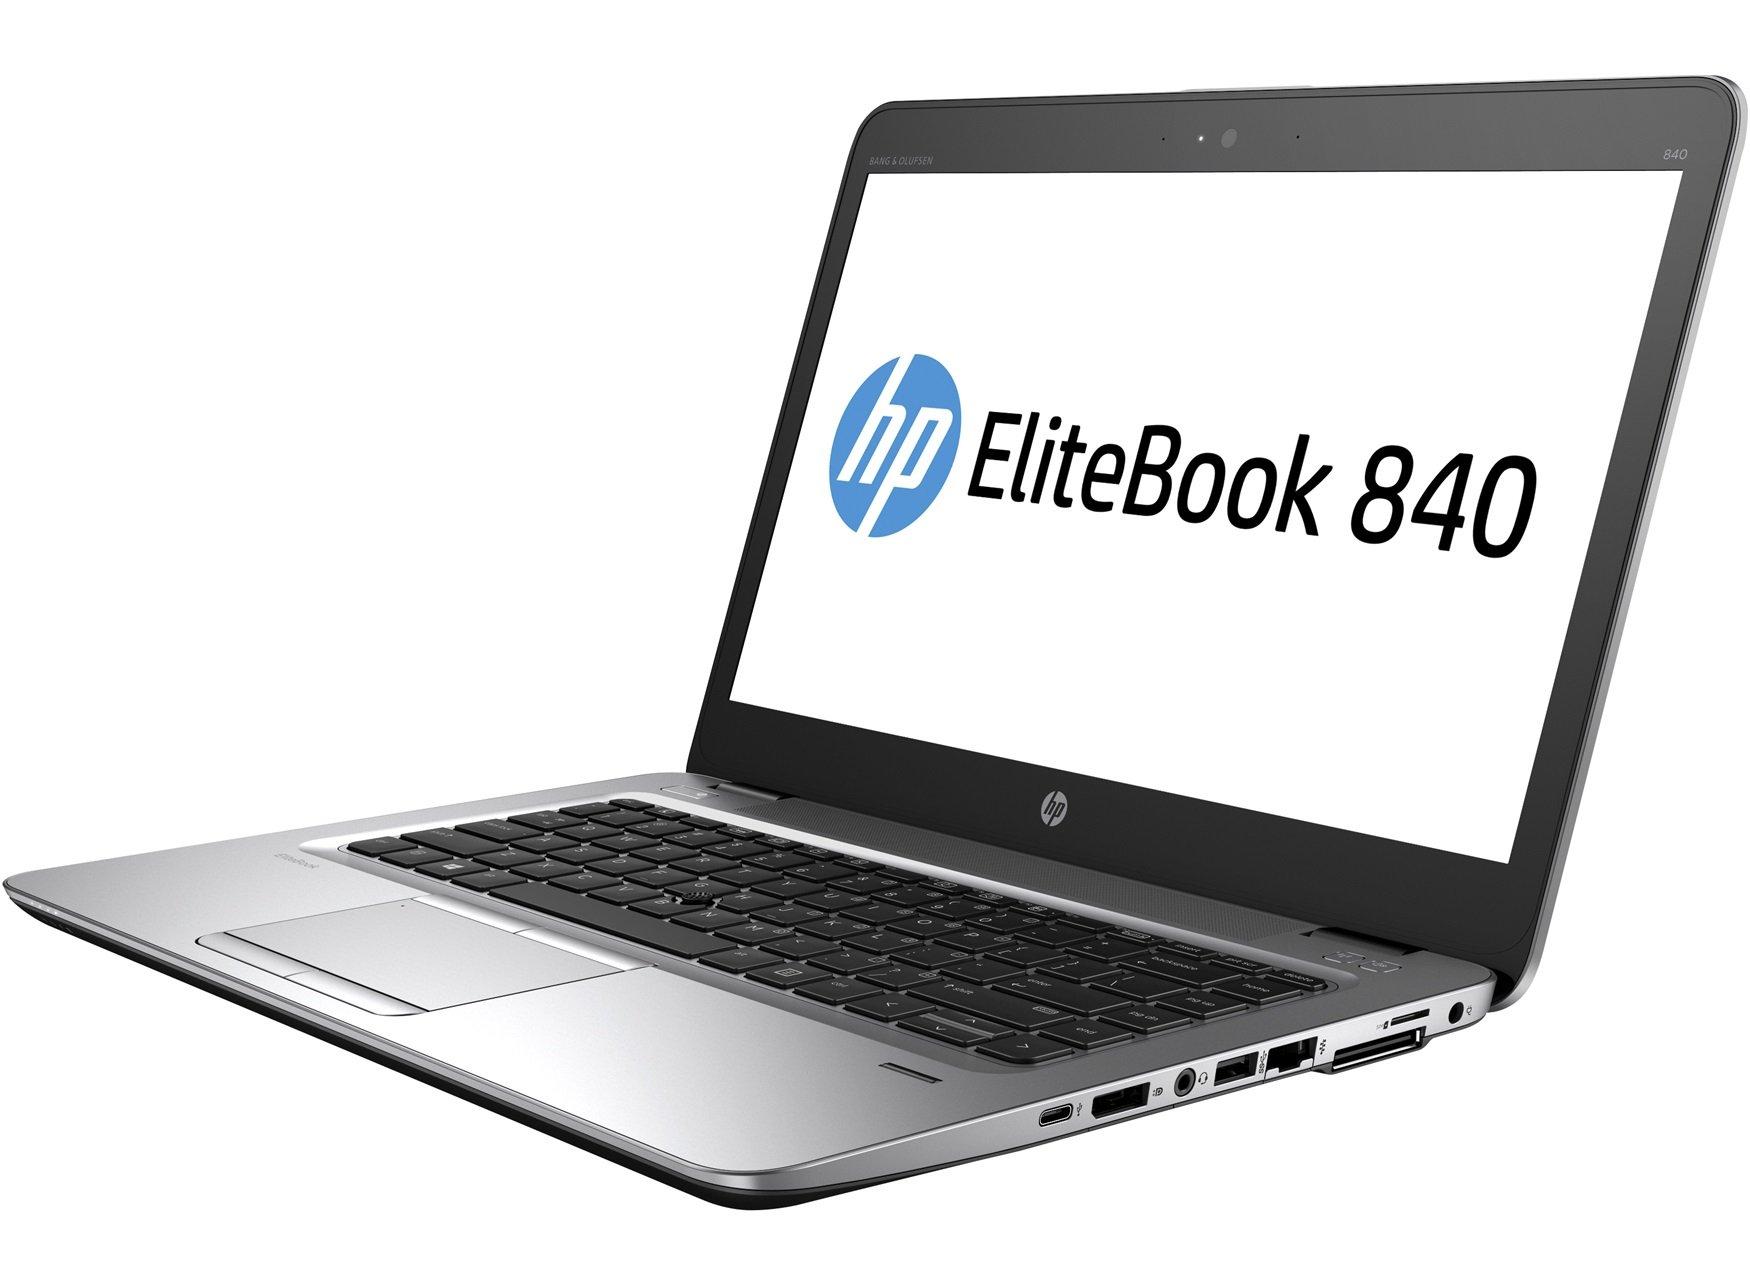 HP Elitebook 840 G1 14.0 Inch High Performanc Laptop Computer, Intel i5 4300U up to 2.9GHz, 16GB Memory, 256GB SSD, USB 3.0, Bluetooth, Window 10 Professional (Renewed)